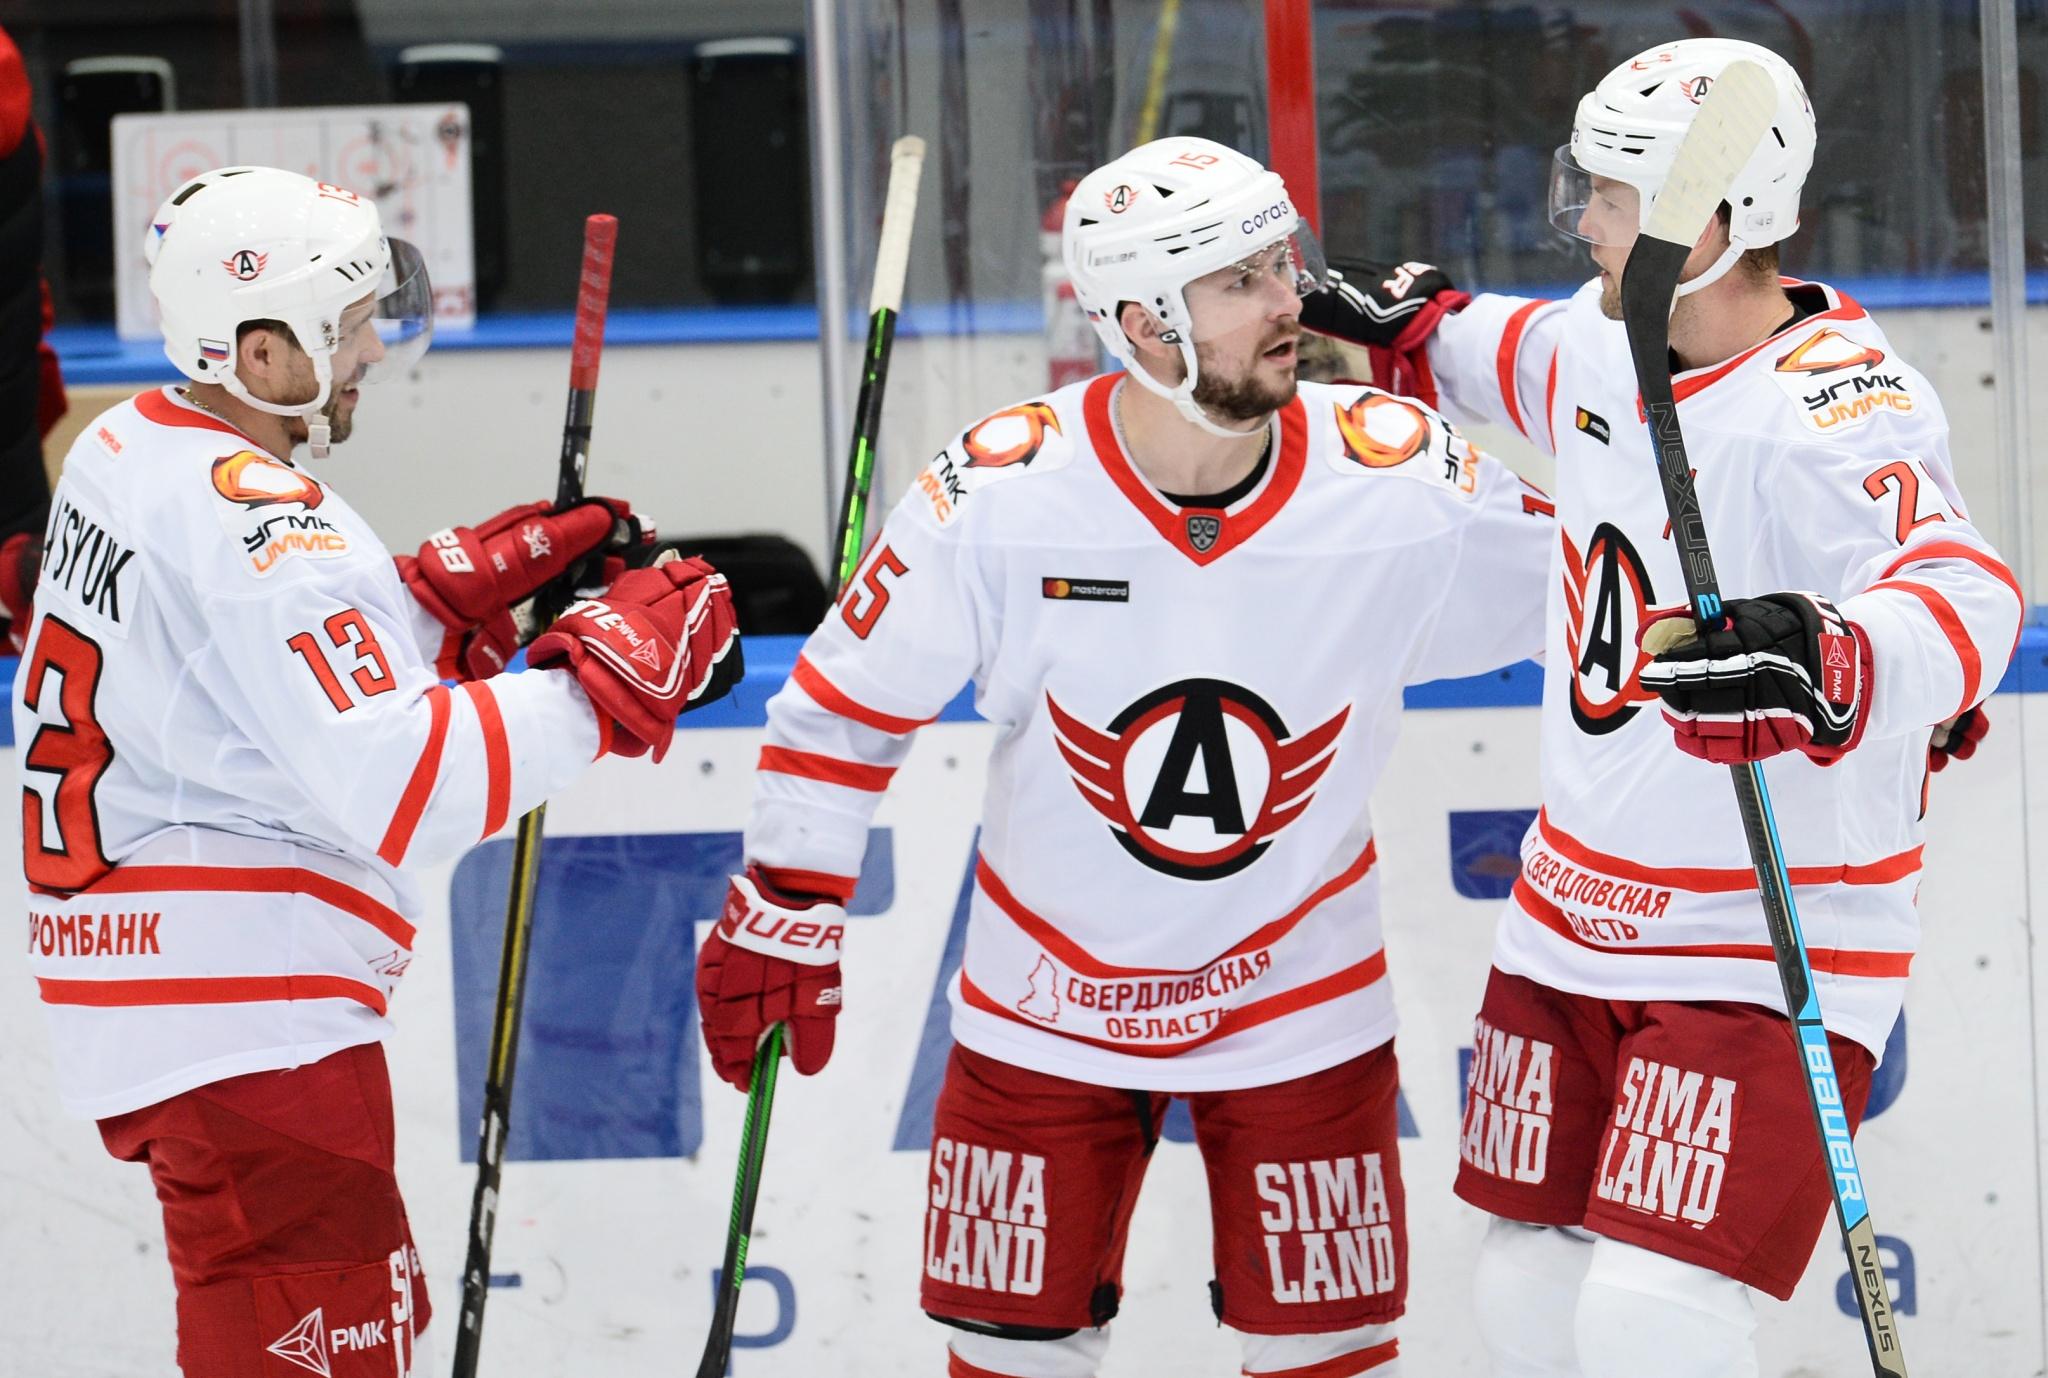 Павел Дацюк, Анатолий Голышев, Питер Холланд. Фото: Григорий Соколов